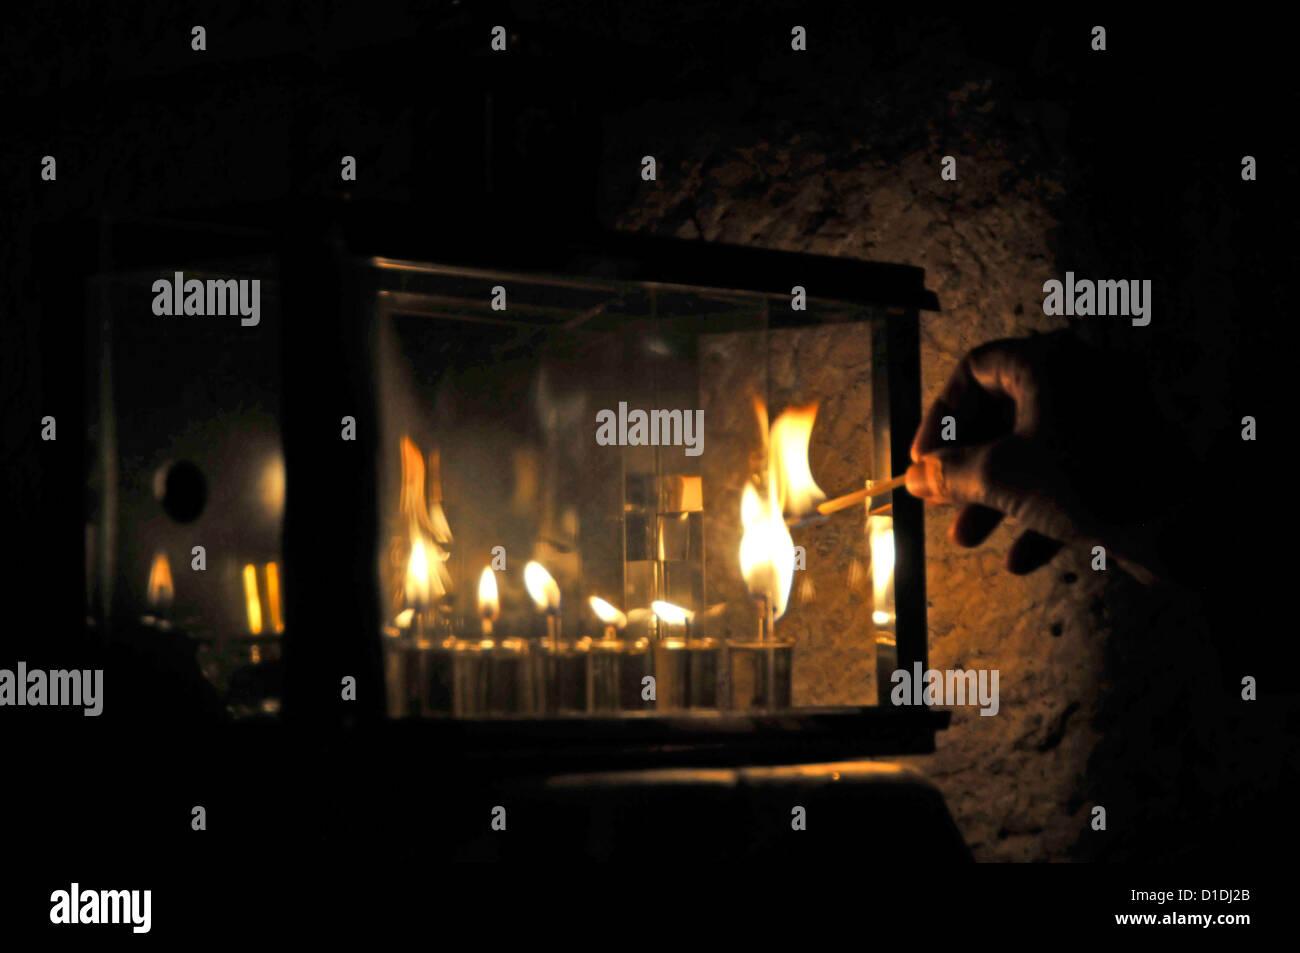 Traditional Hanukkah Candle lighting - Stock Image